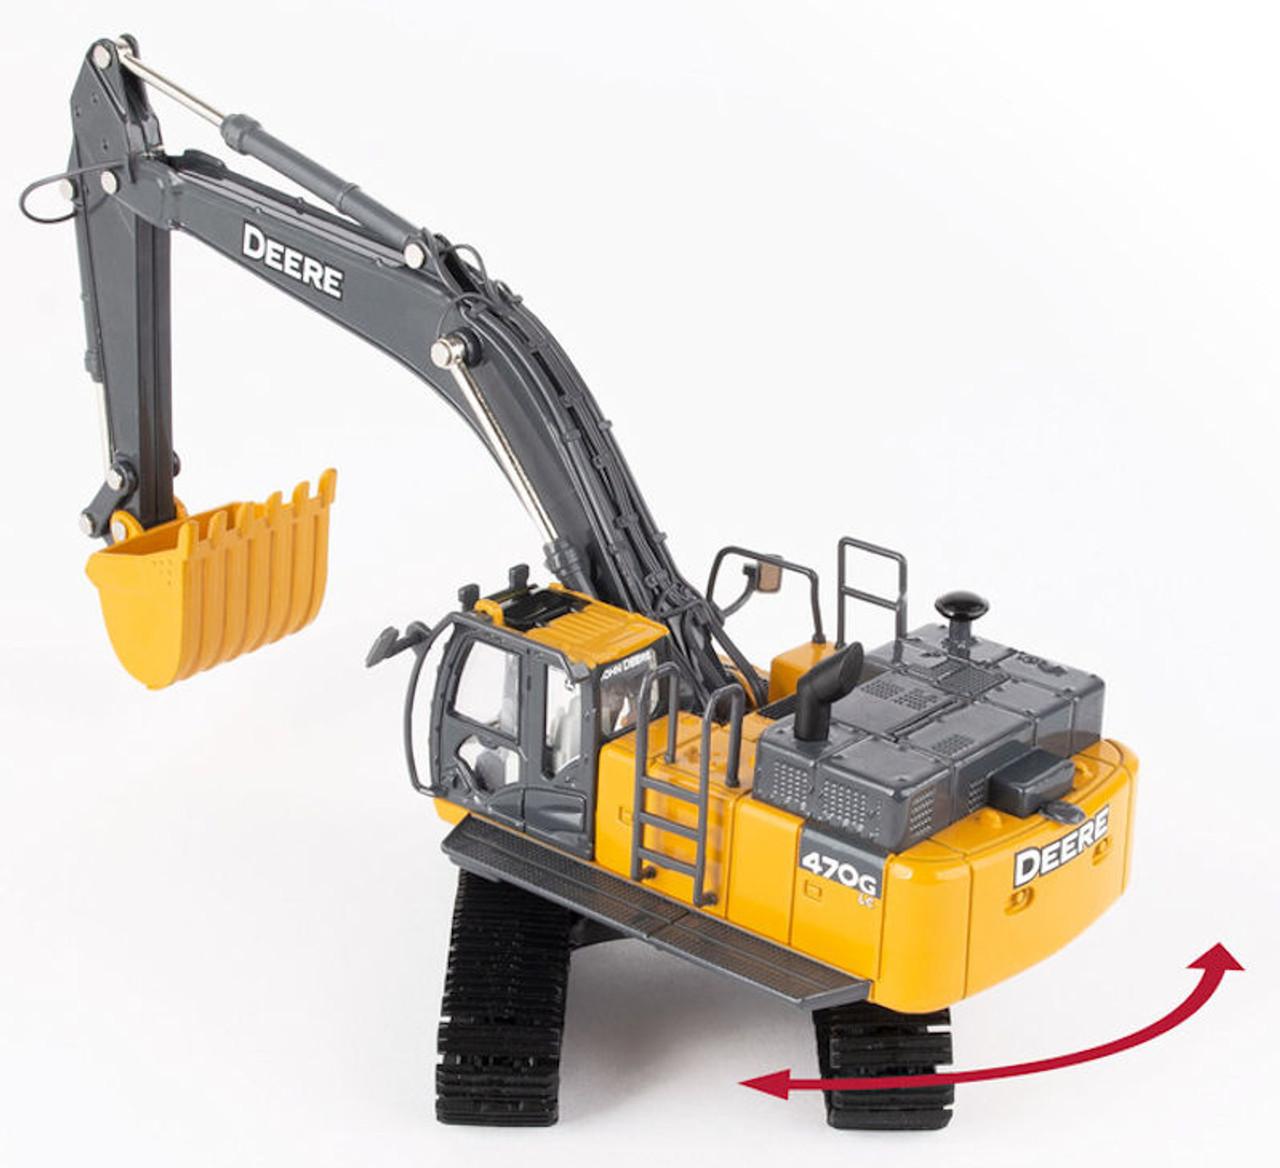 ERTL John Deere 470 GLC Excavator TBE45335 1/50 Scale